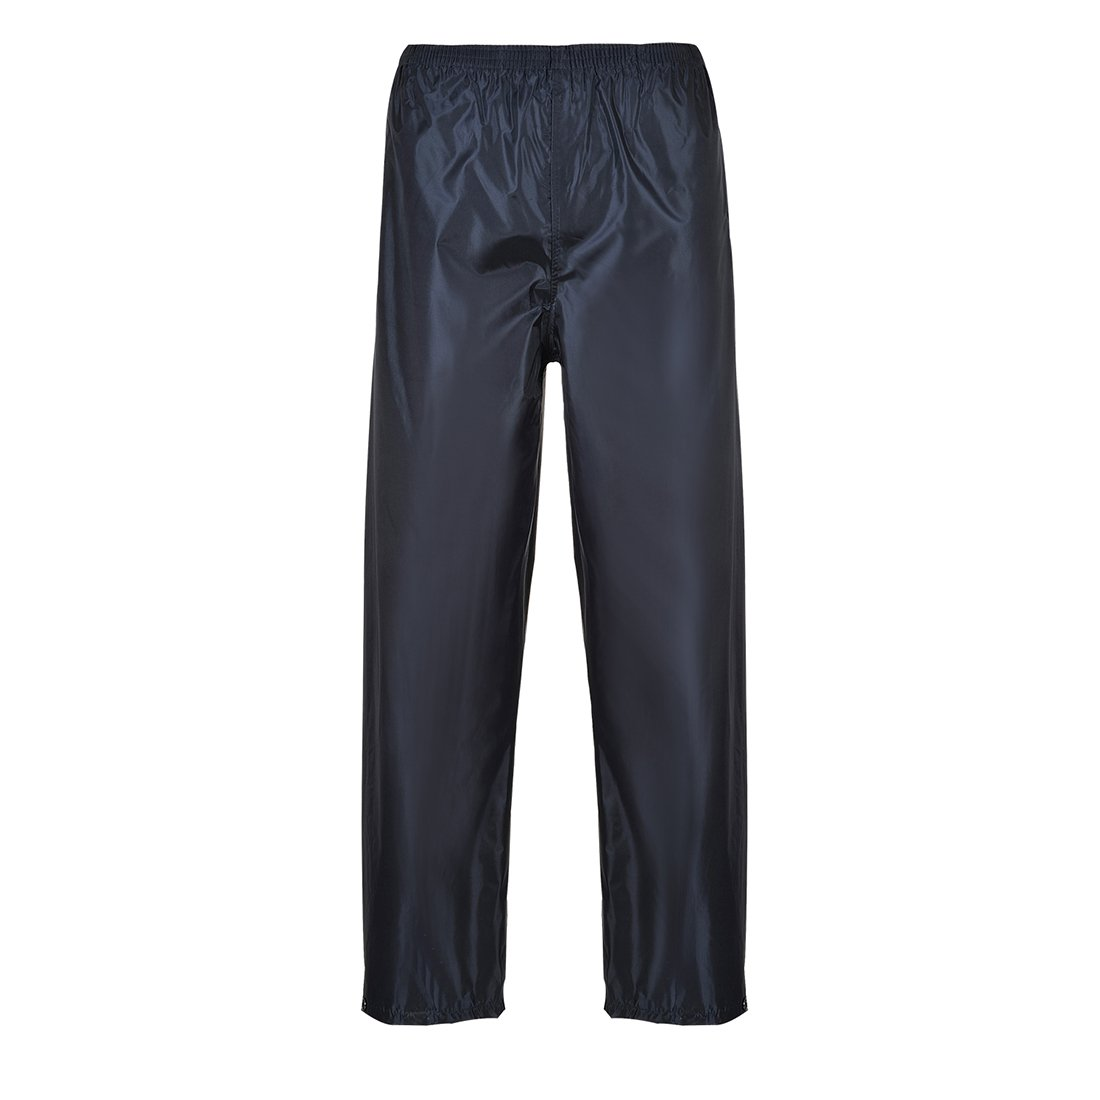 Portwest US441NAR4XL Regular Fit Classic Adult Rain Pants, 4X-Large, Navy